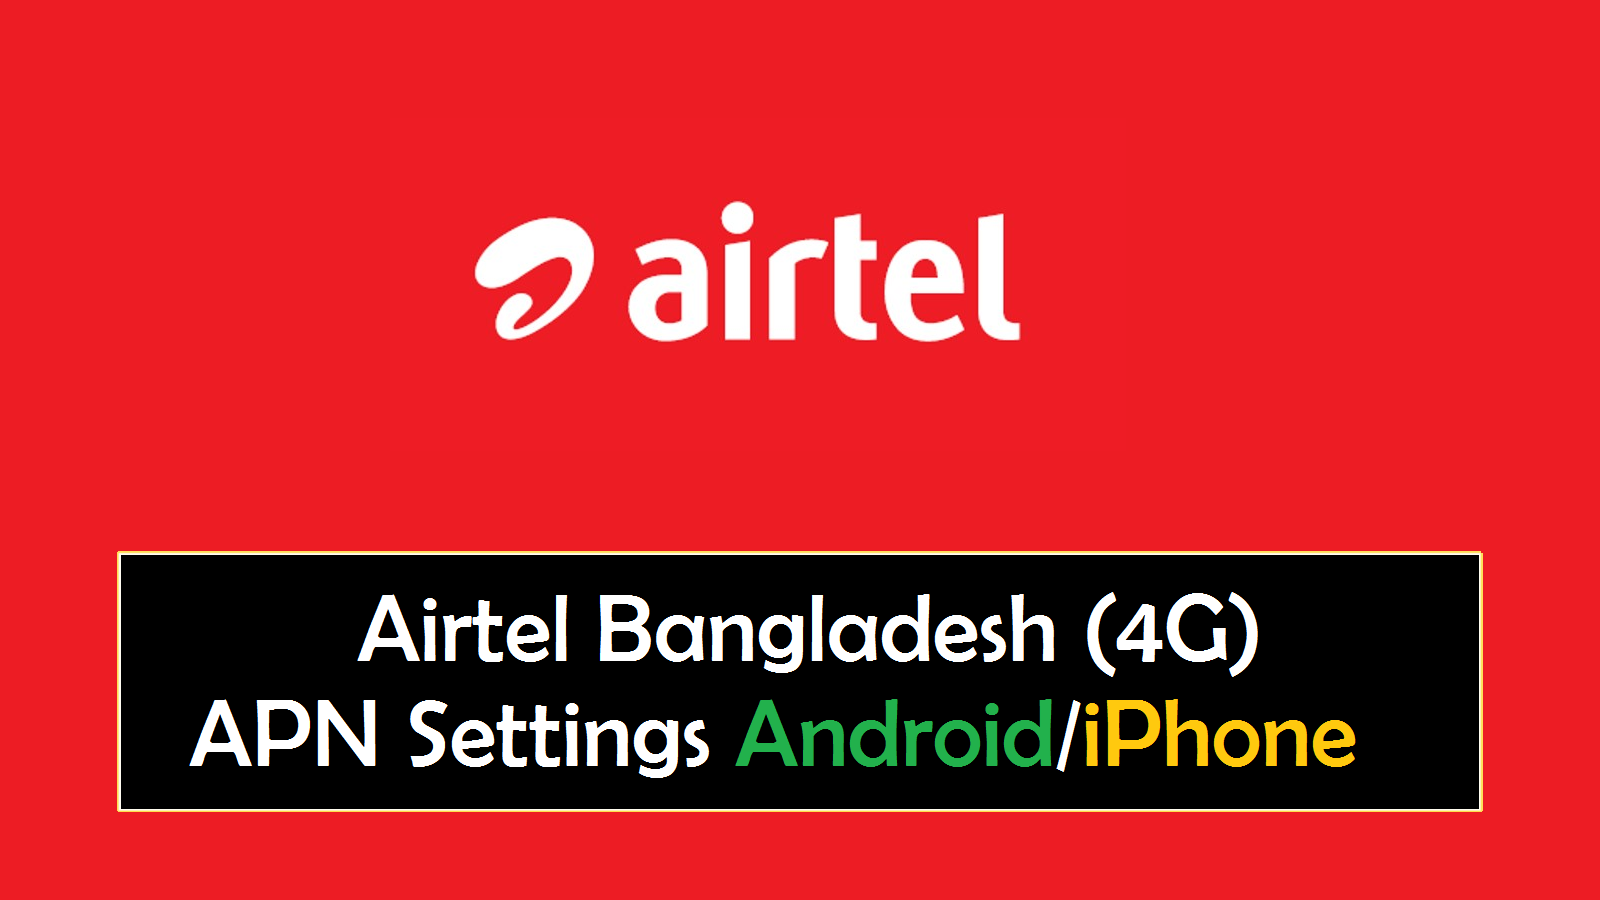 Airtel Bangladesh (4G) APN Settings